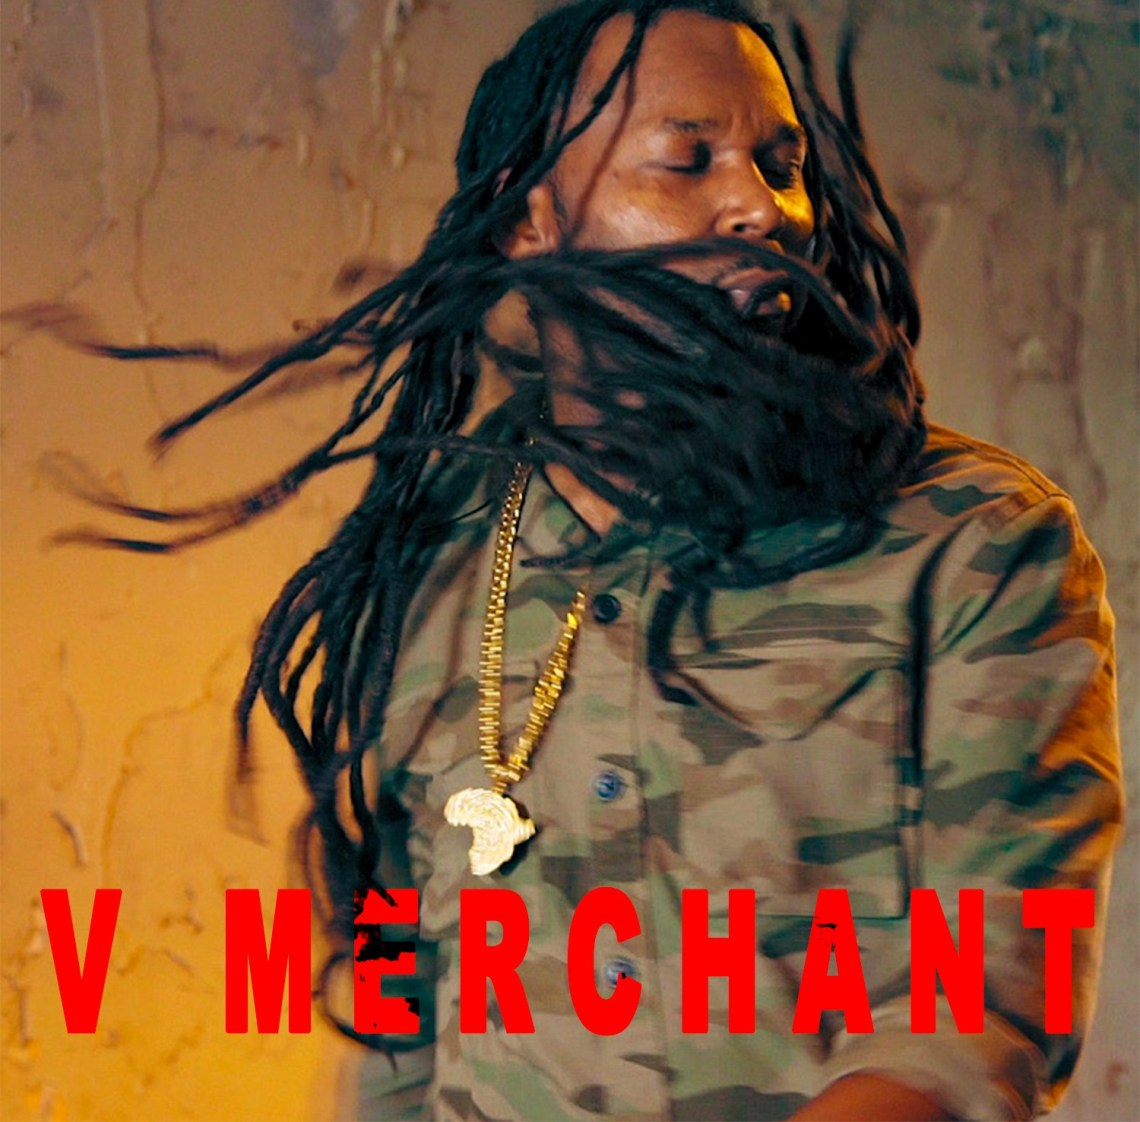 V Merchant